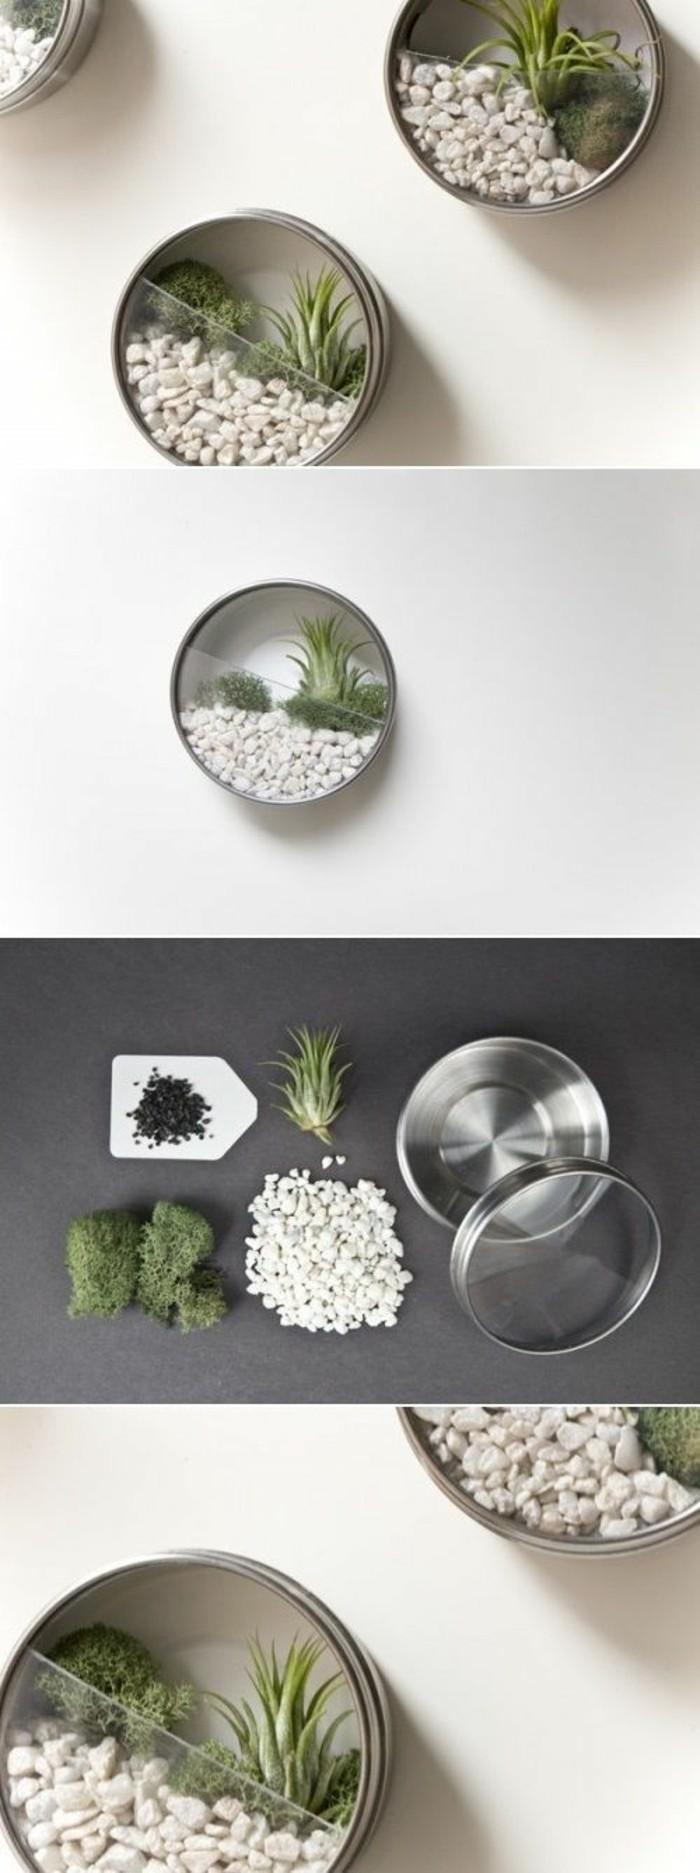 pequeño terrario hecho con partes de latas, bonitas ideas de manualidades con reciclar latas de conserva